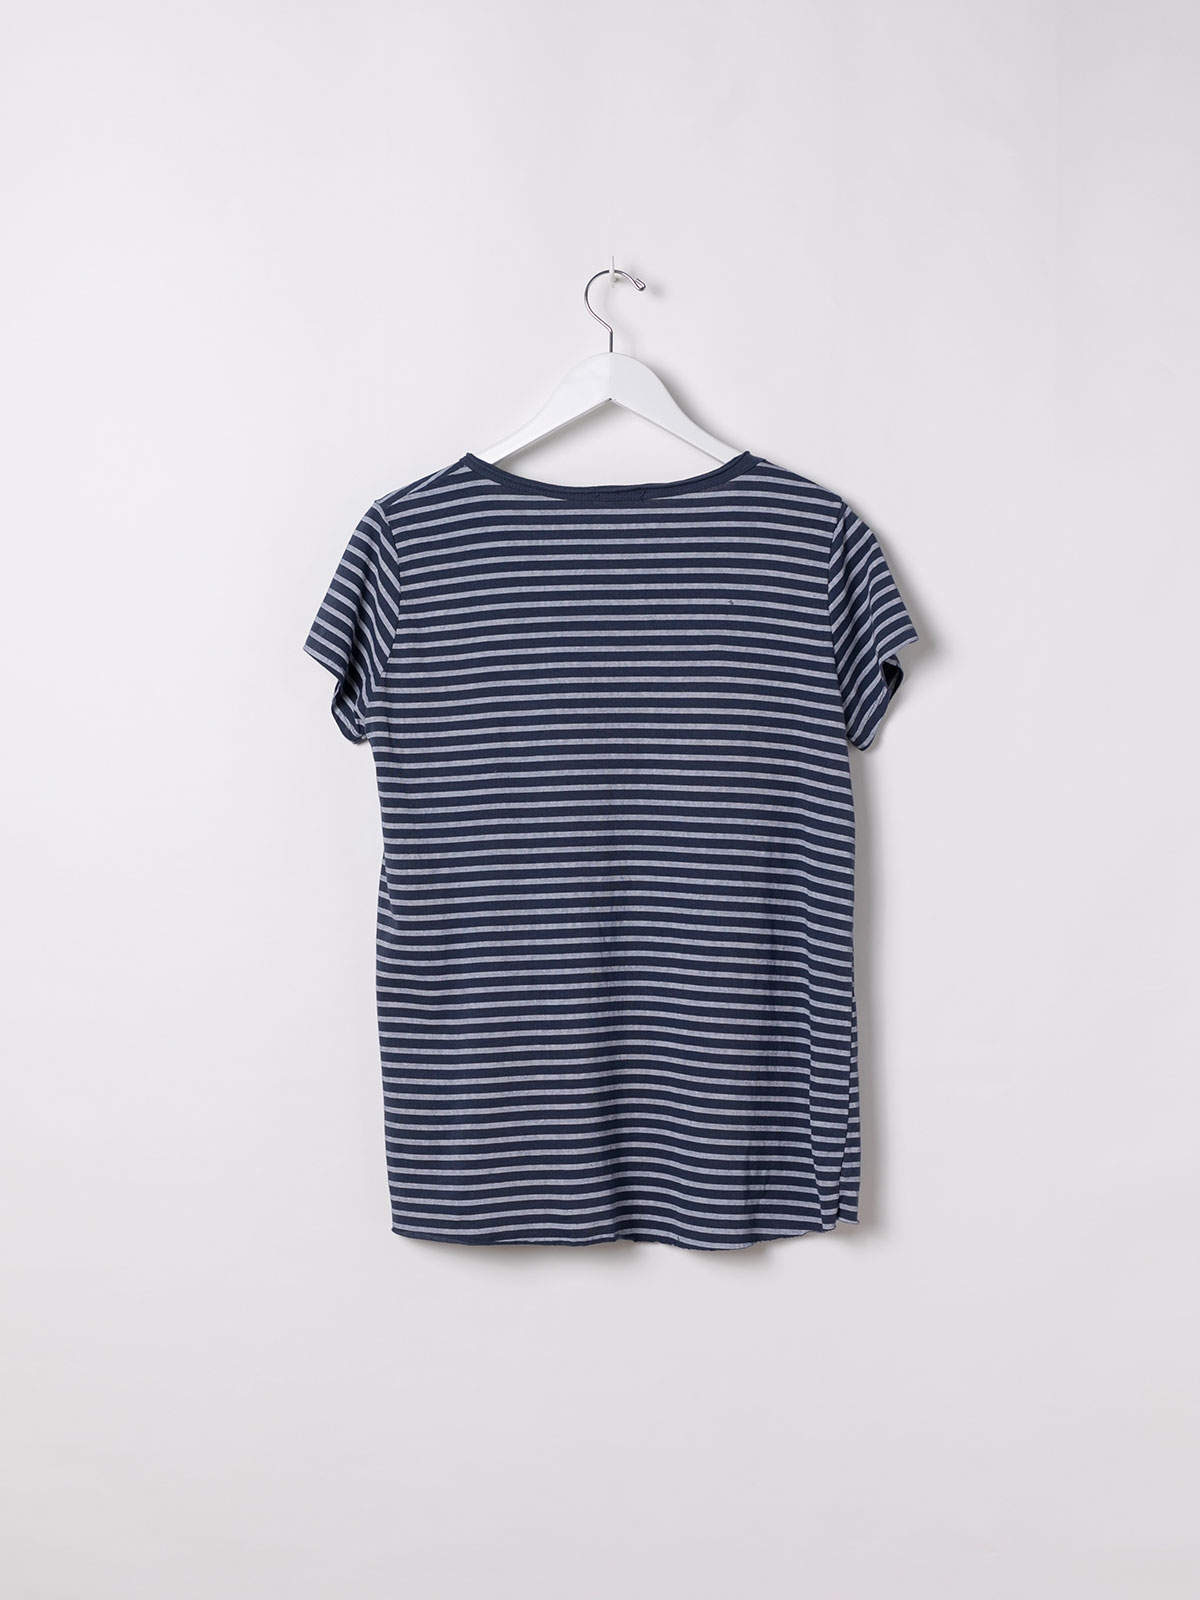 Camiseta mujer rayas algodón Azul Marino